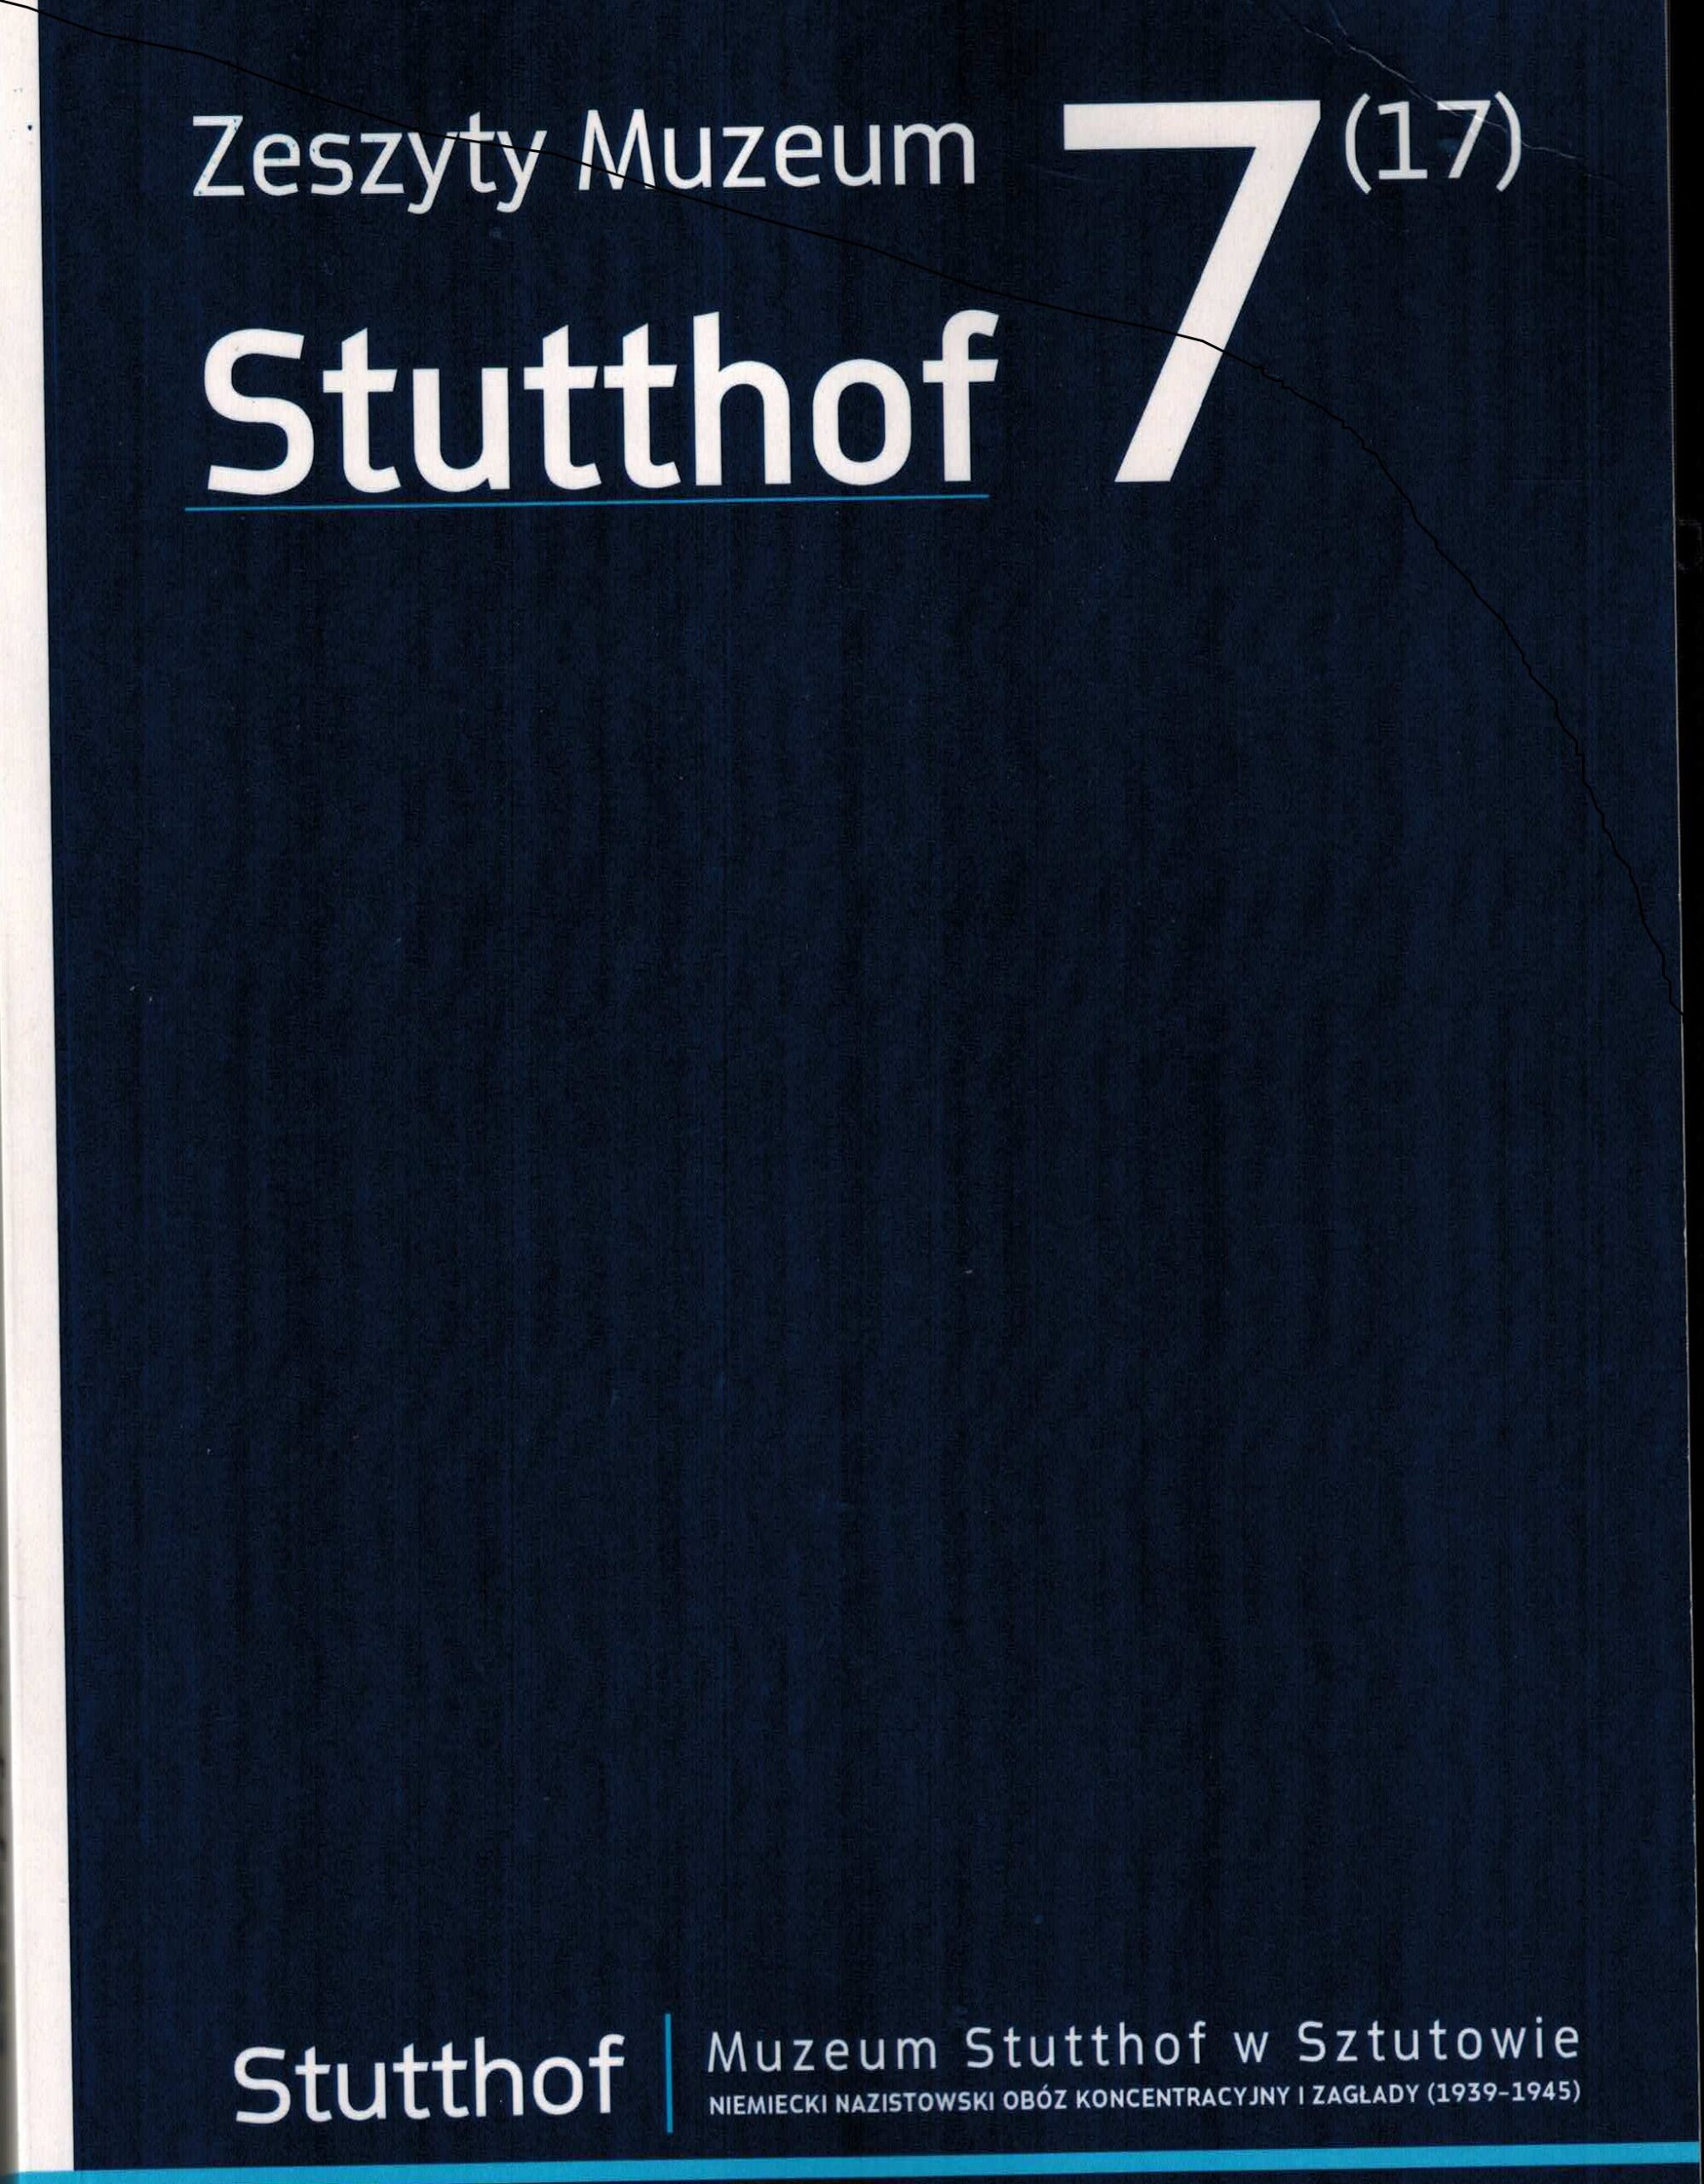 okładka Zeszyty Muzeum Stutthof nr 7